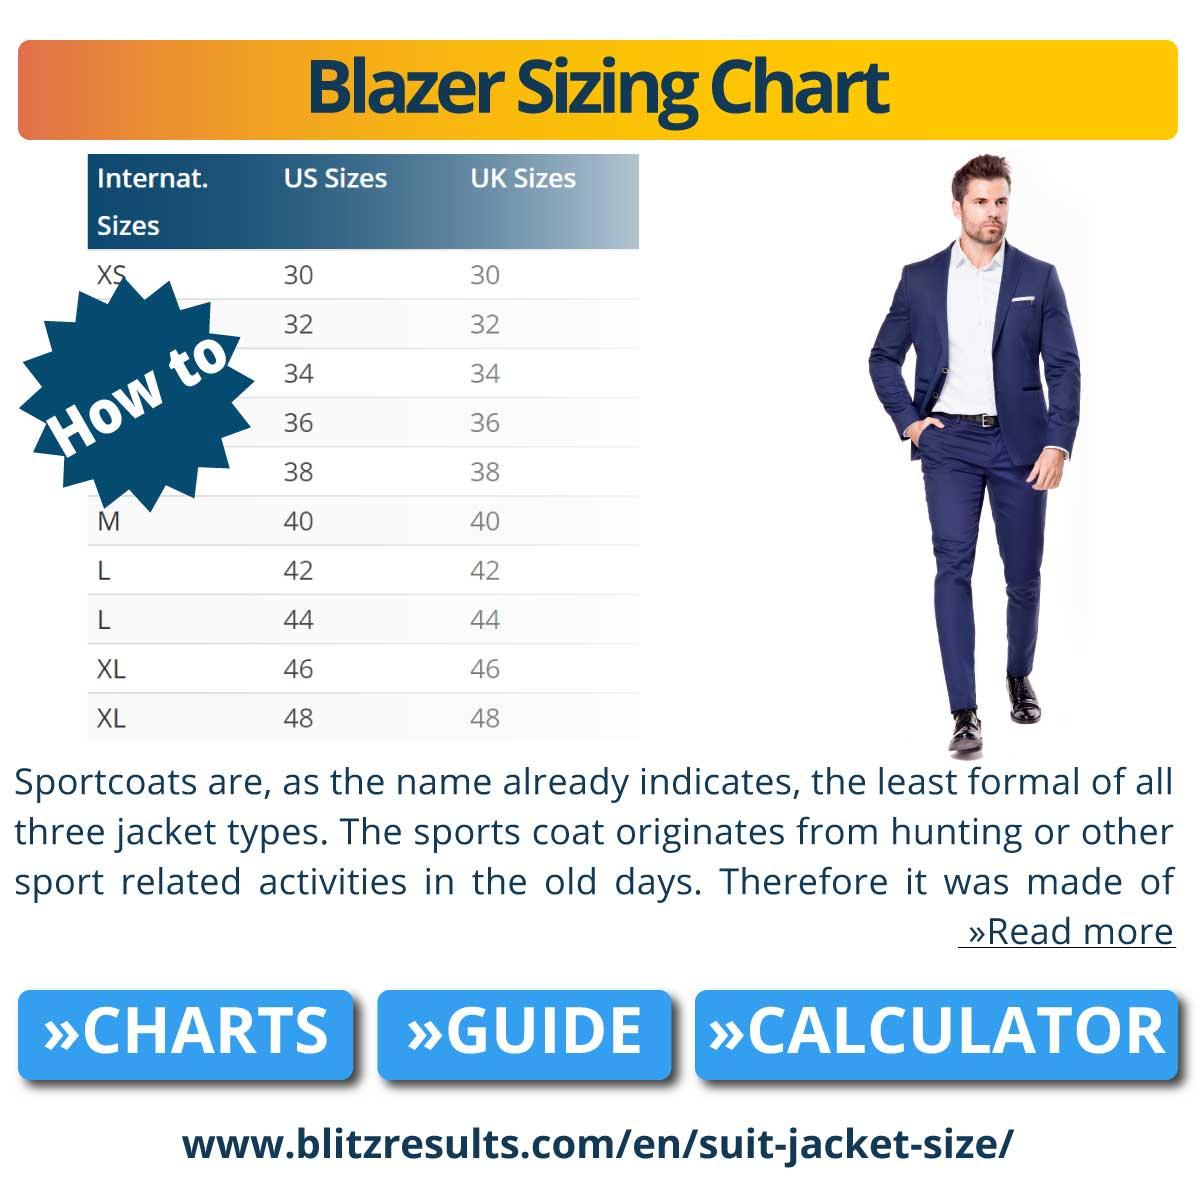 Blazer Sizing Chart